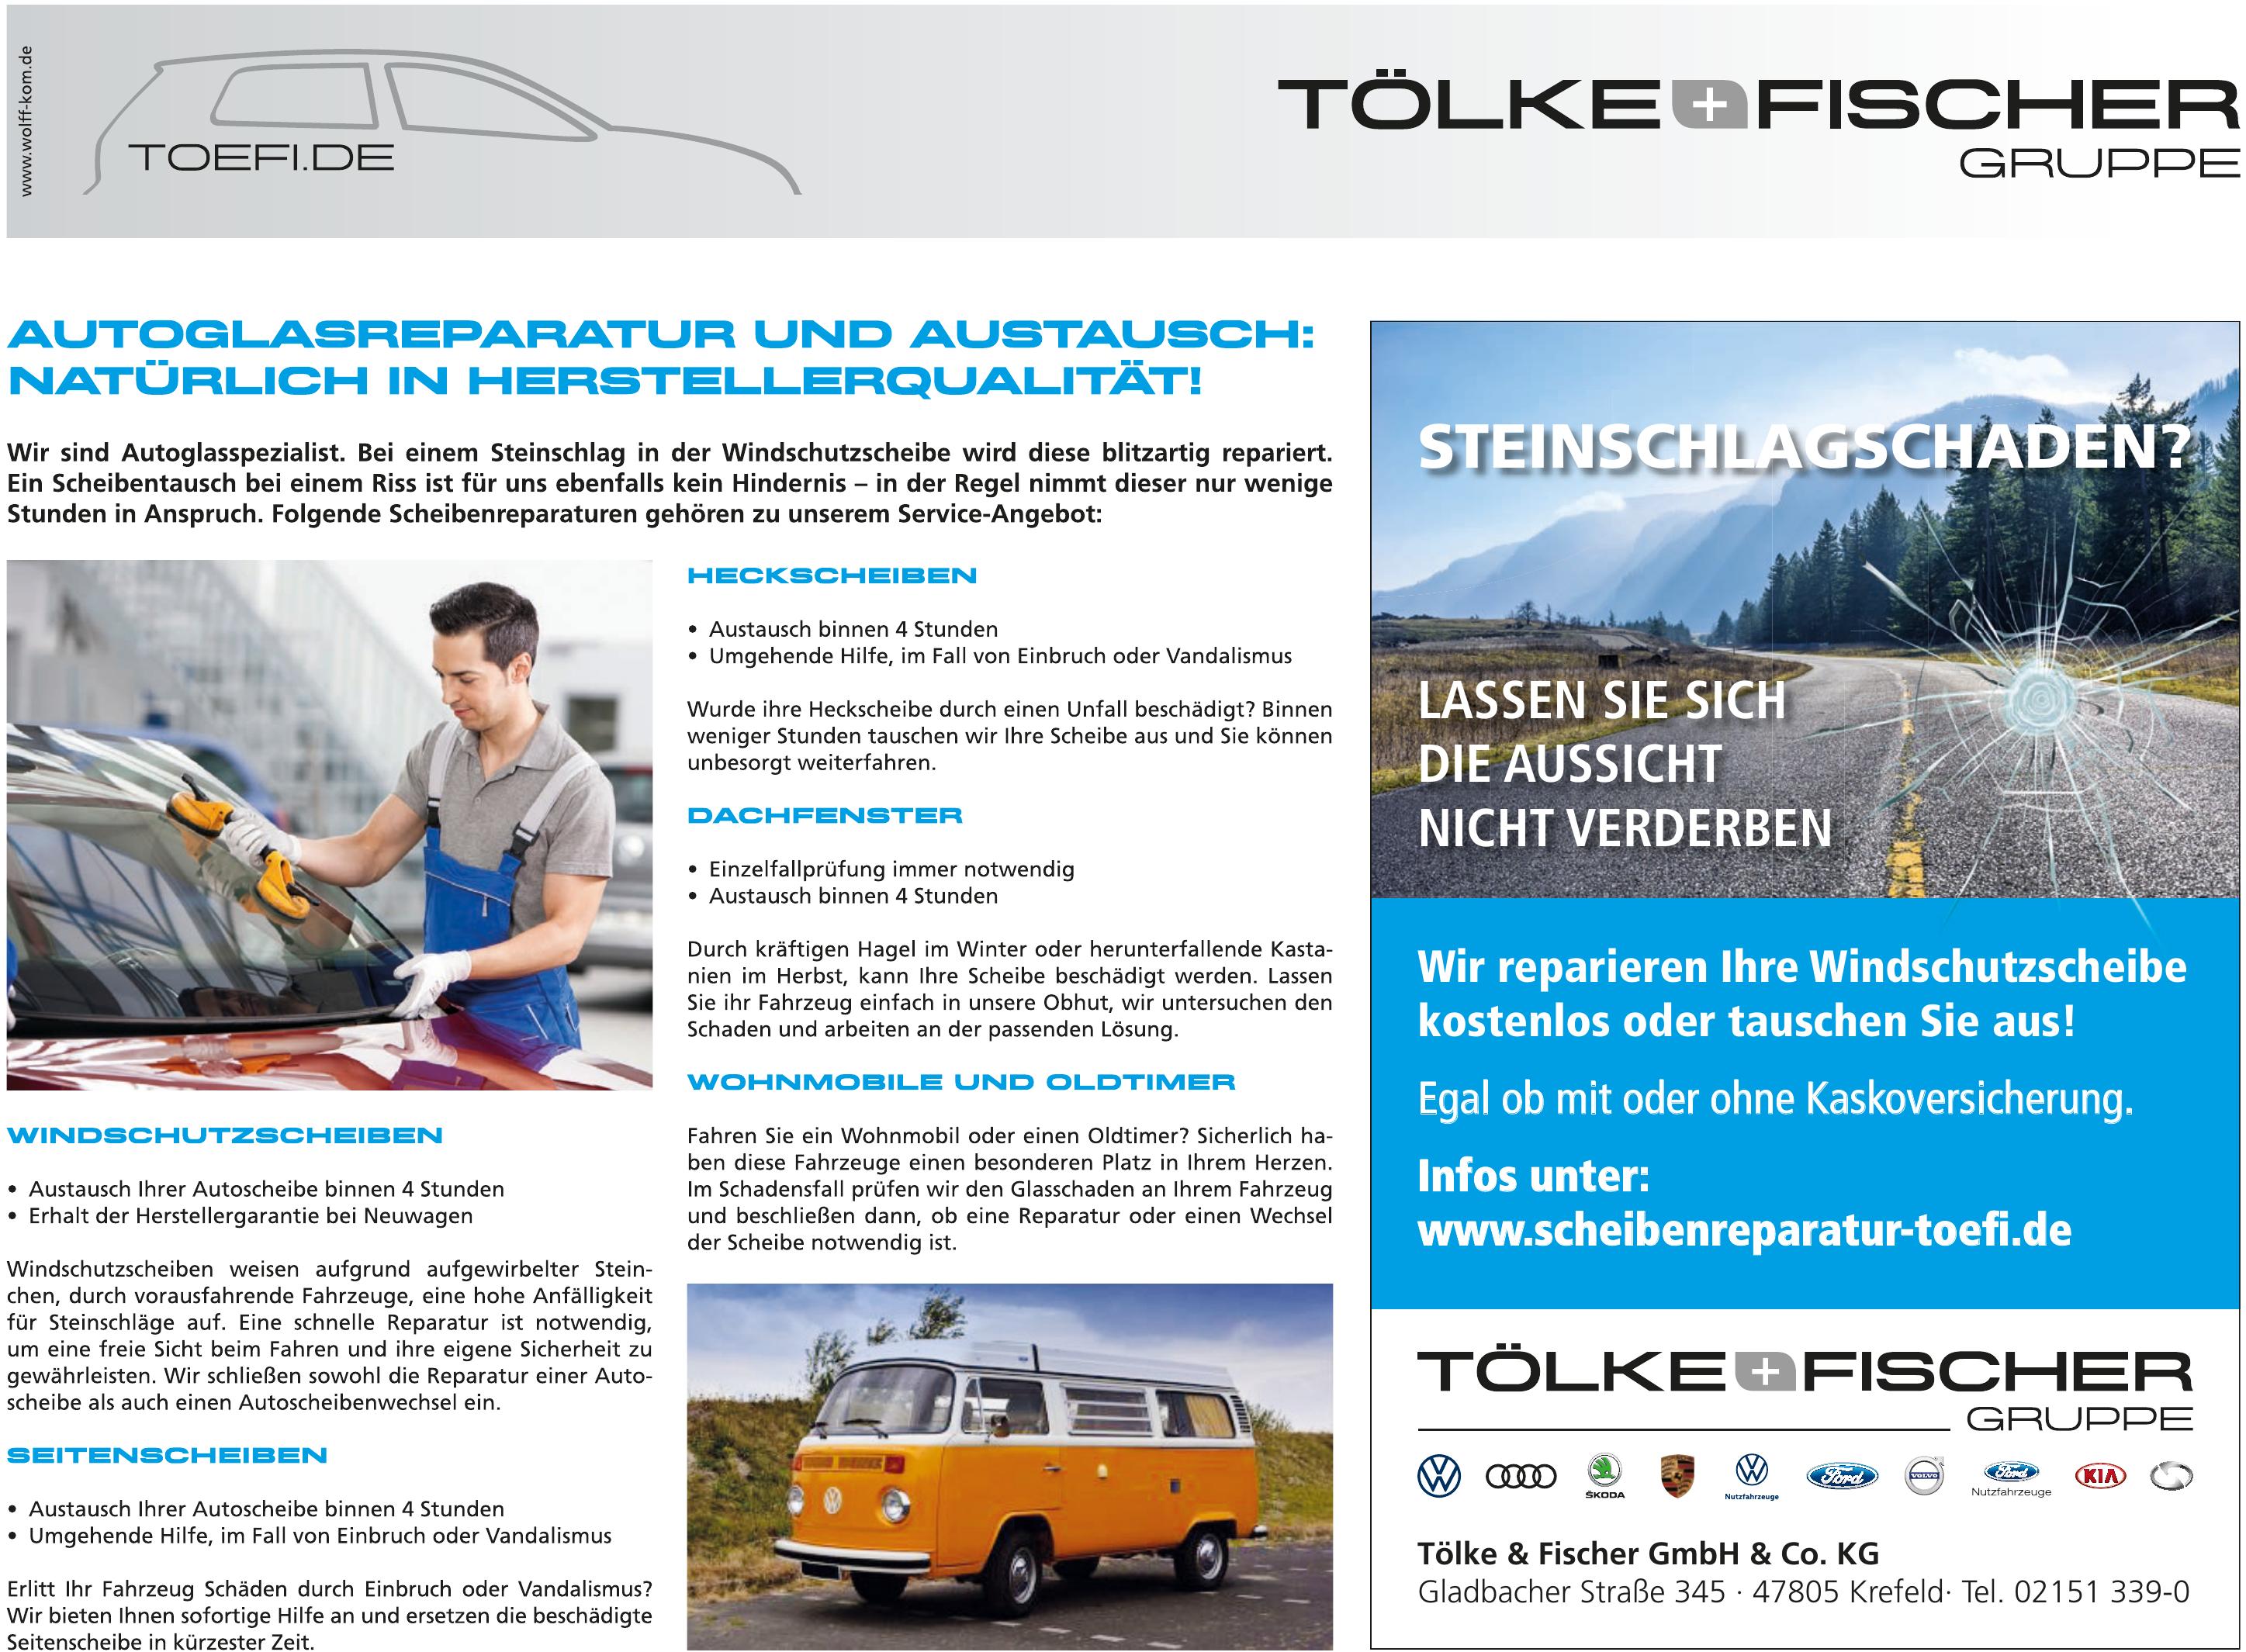 Tölke & Fischer GmbH & Co. KG